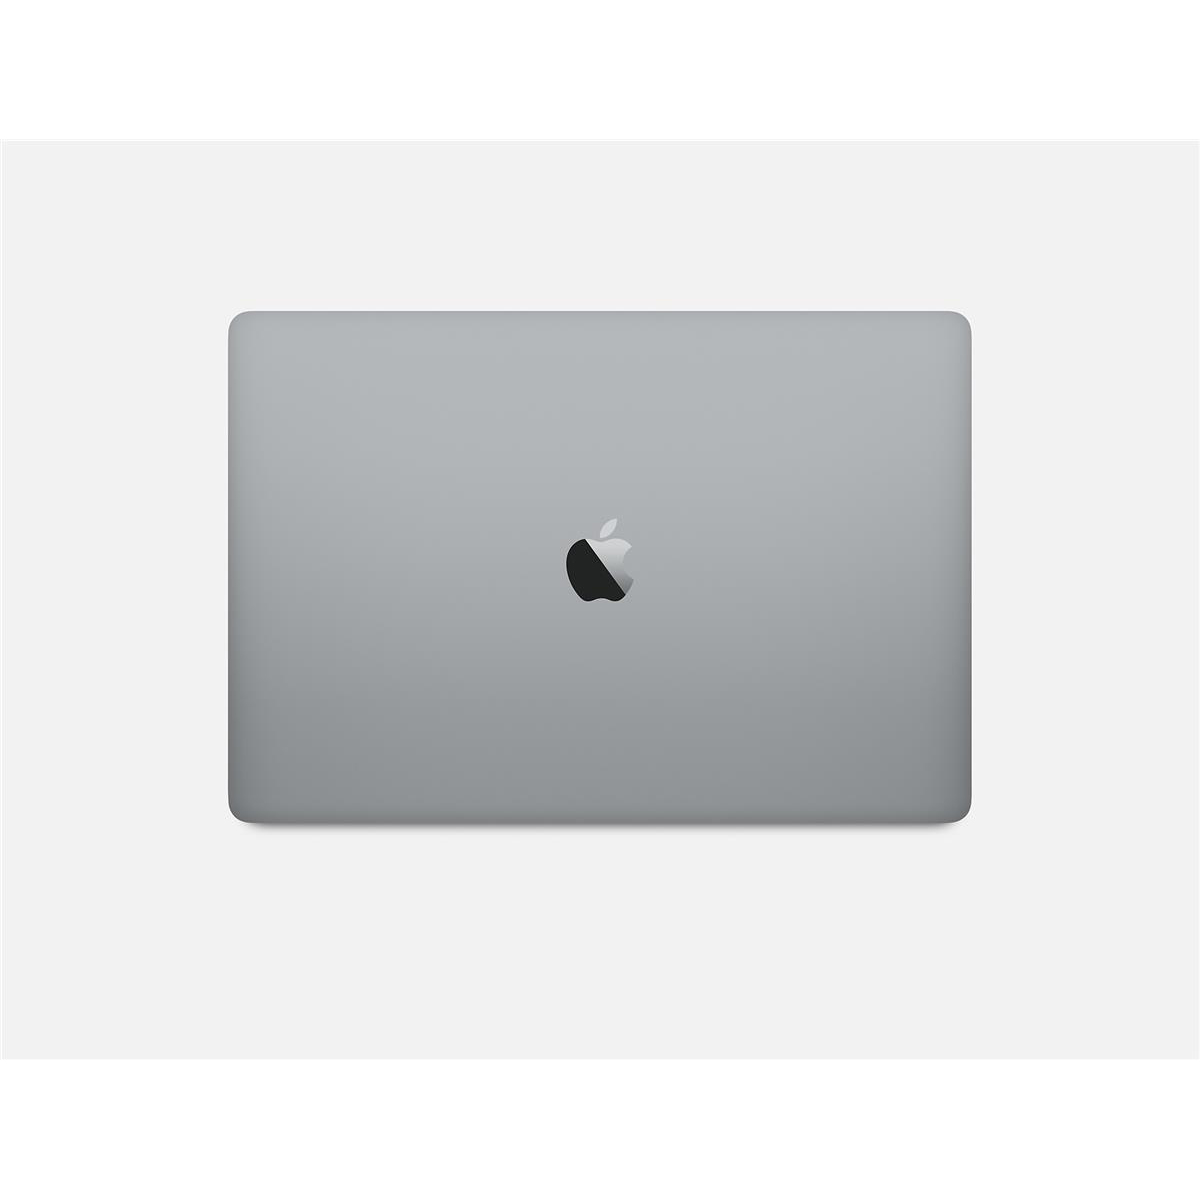 Apple MacBook Pro Mac OS Wi-Fi 16GB RAM 512GB SDD 10-hour Battery 15.4in Space Grey Ref MPTT2B/A